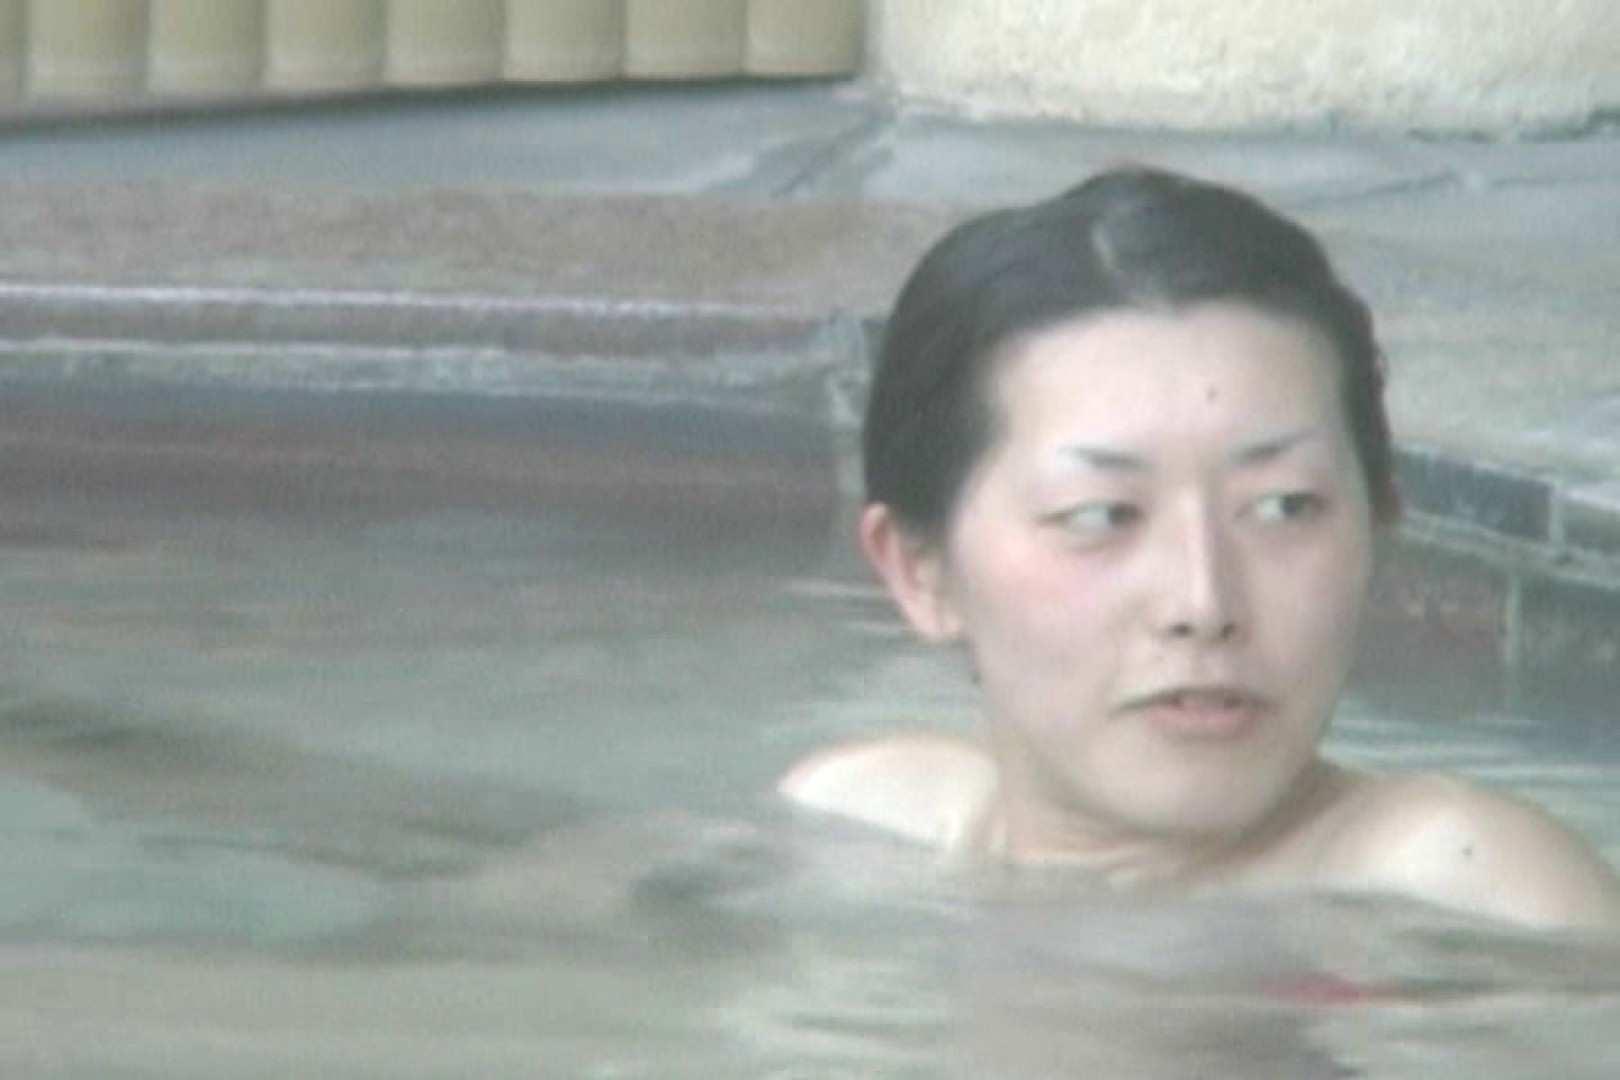 Aquaな露天風呂Vol.589 盗撮 | HなOL  105pic 17